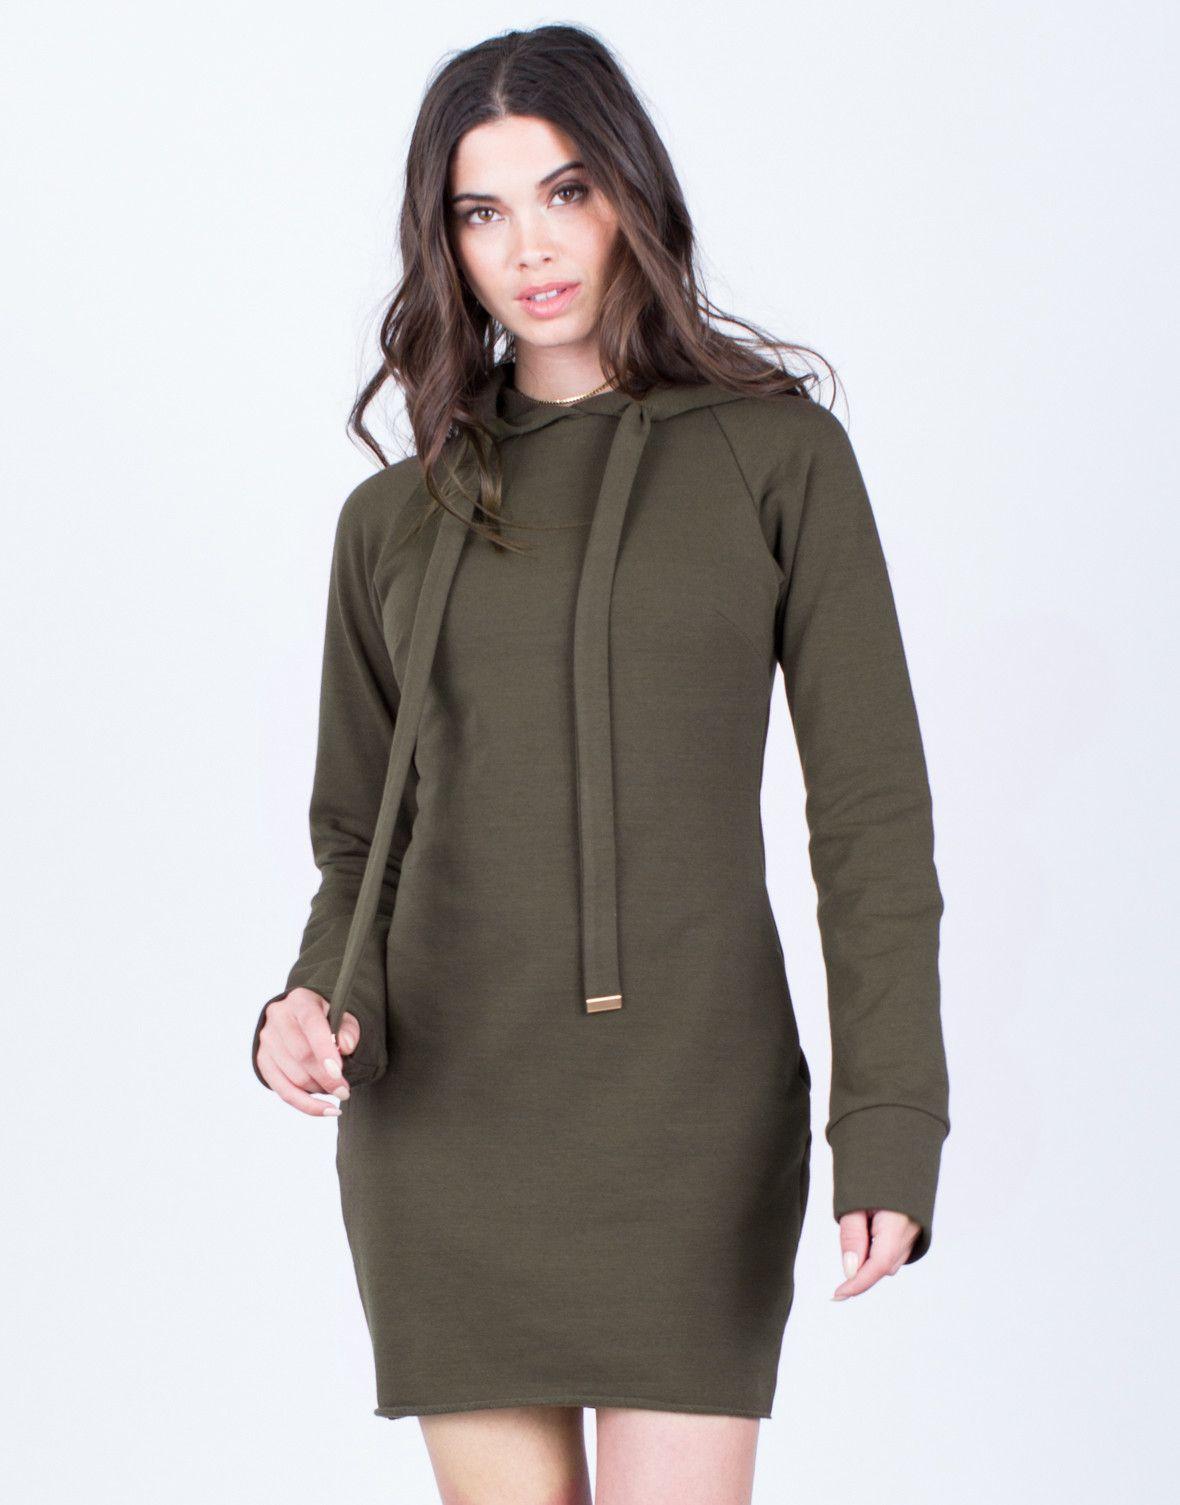 Hoodie Sweater Dress | Heather grey, Hoodie and Gray